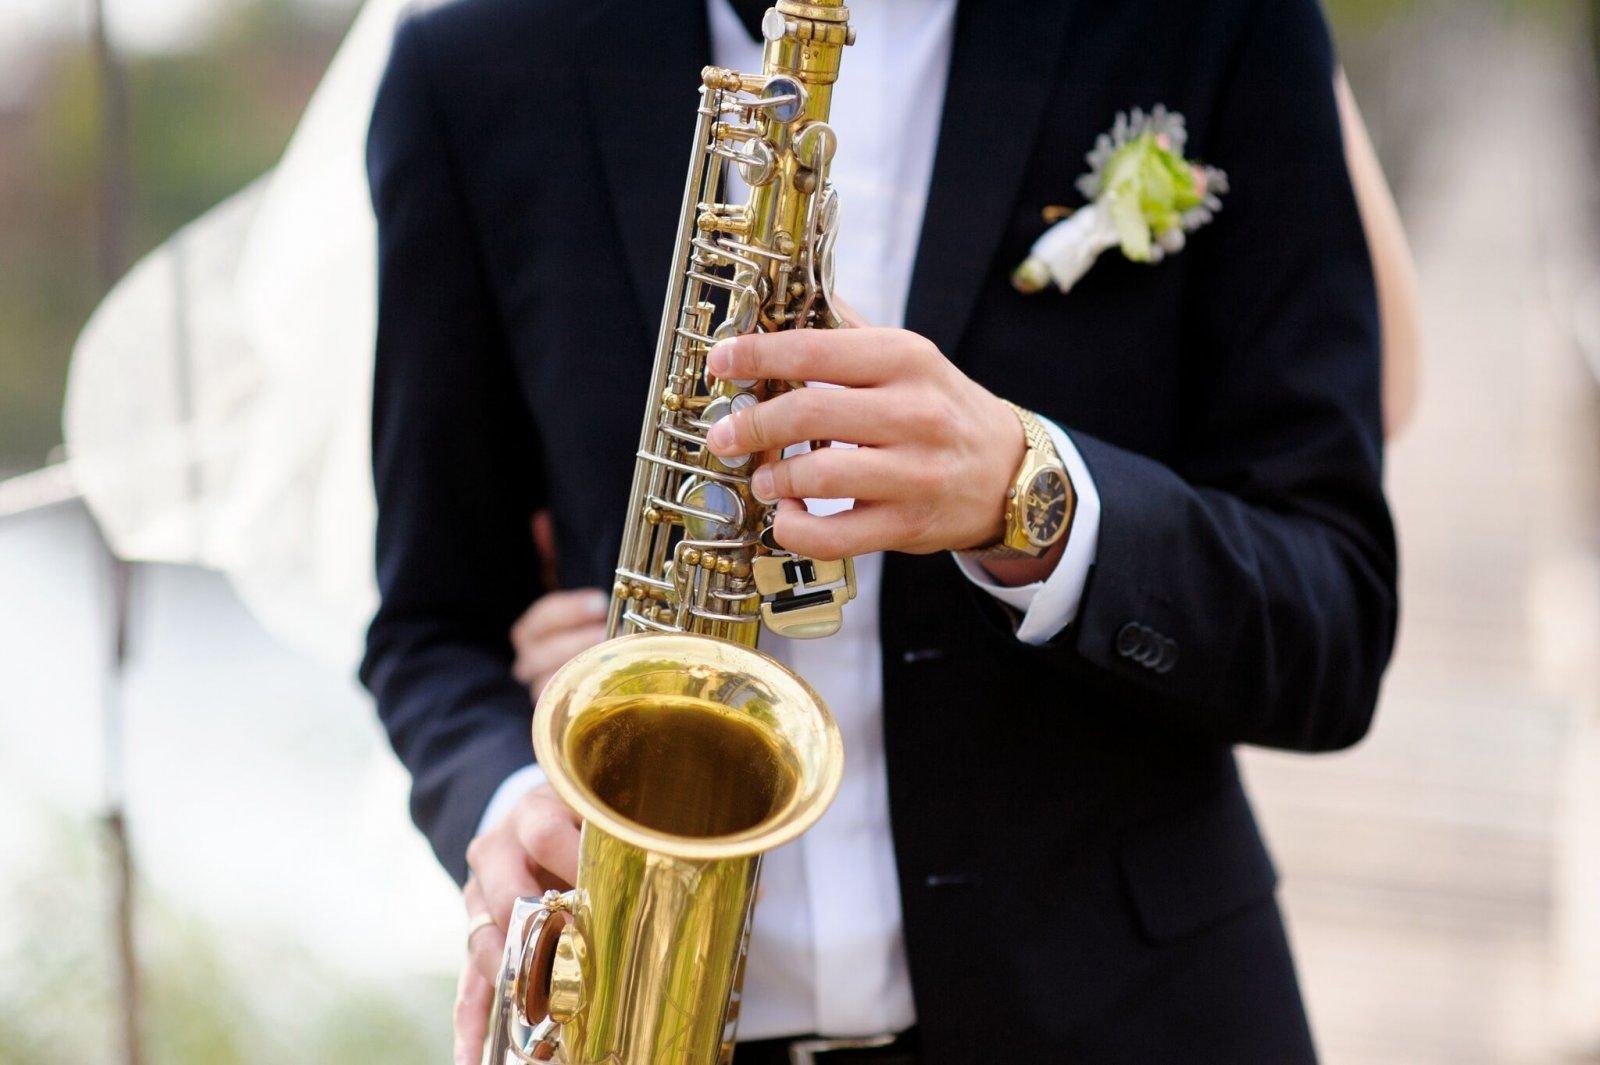 saxofoon saxofonisten saxofonis boeken.jpeg